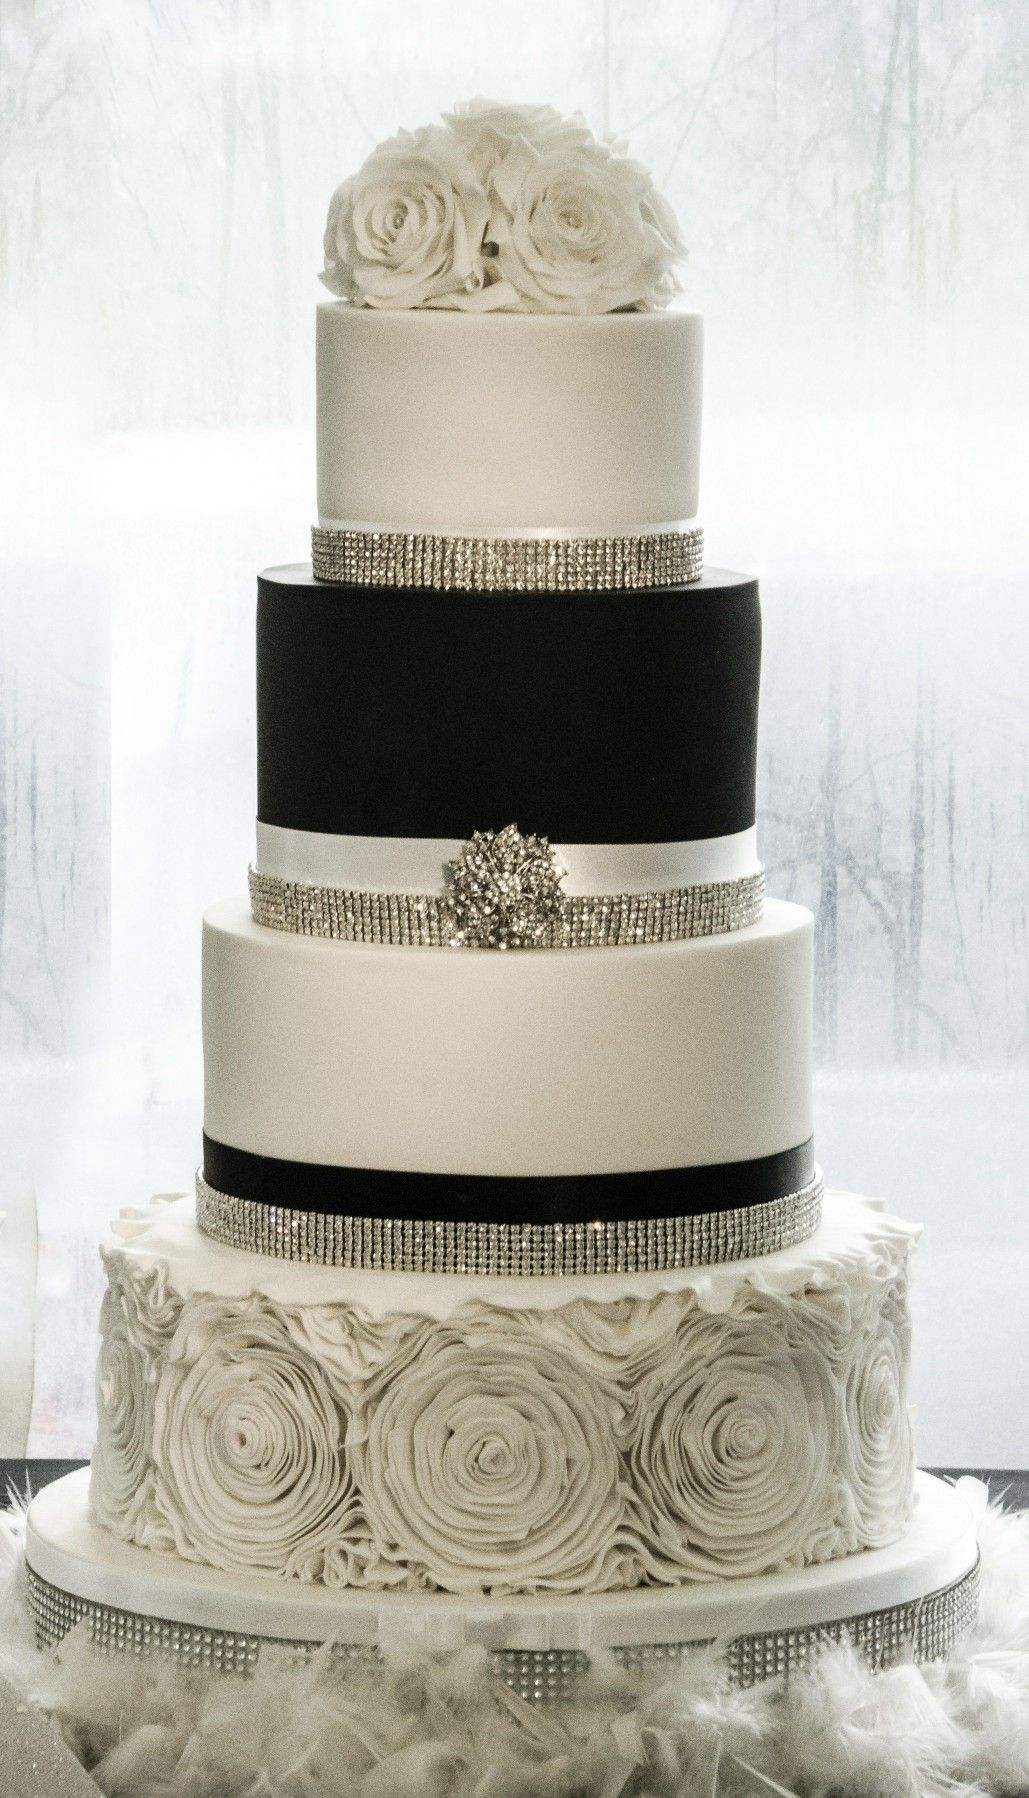 Winter Wedding Cake Black And White Wedding Cake Bling Wedding Cake Ruffle Wedding Cake Black And White Wedding Cake Bling Wedding Cakes Ruffle Wedding Cake